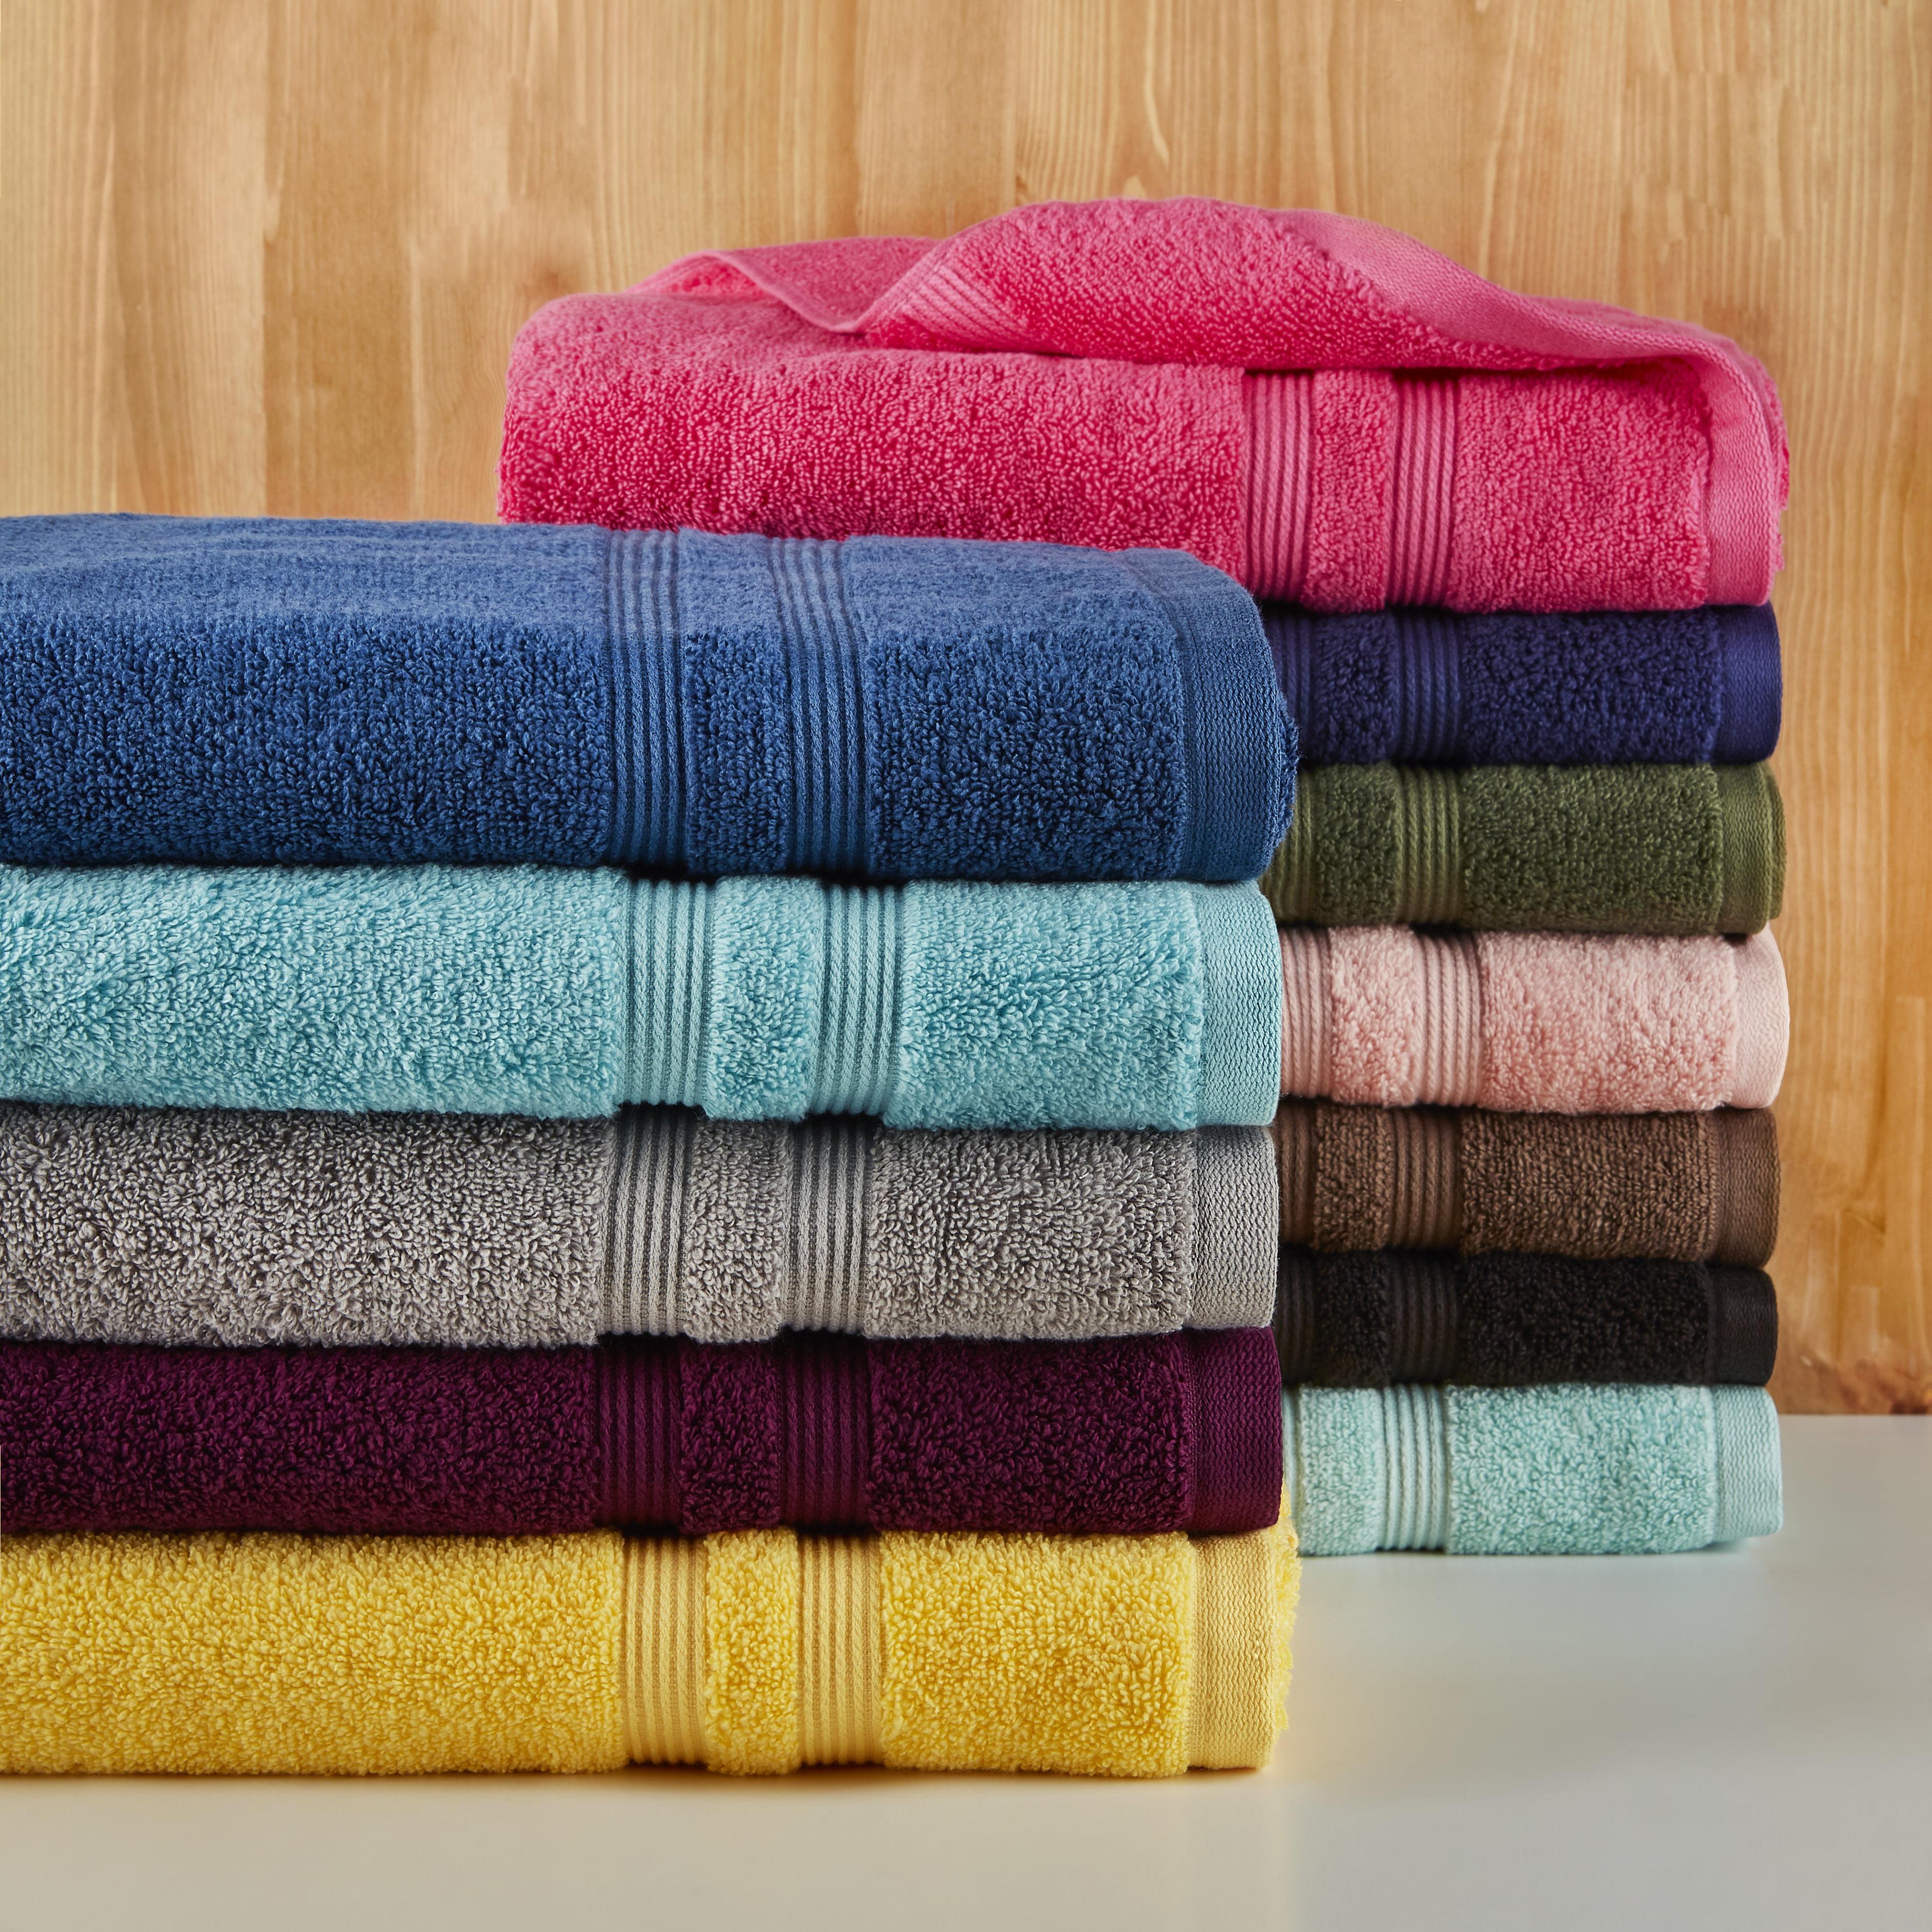 Mainstays Solid Performance Towel